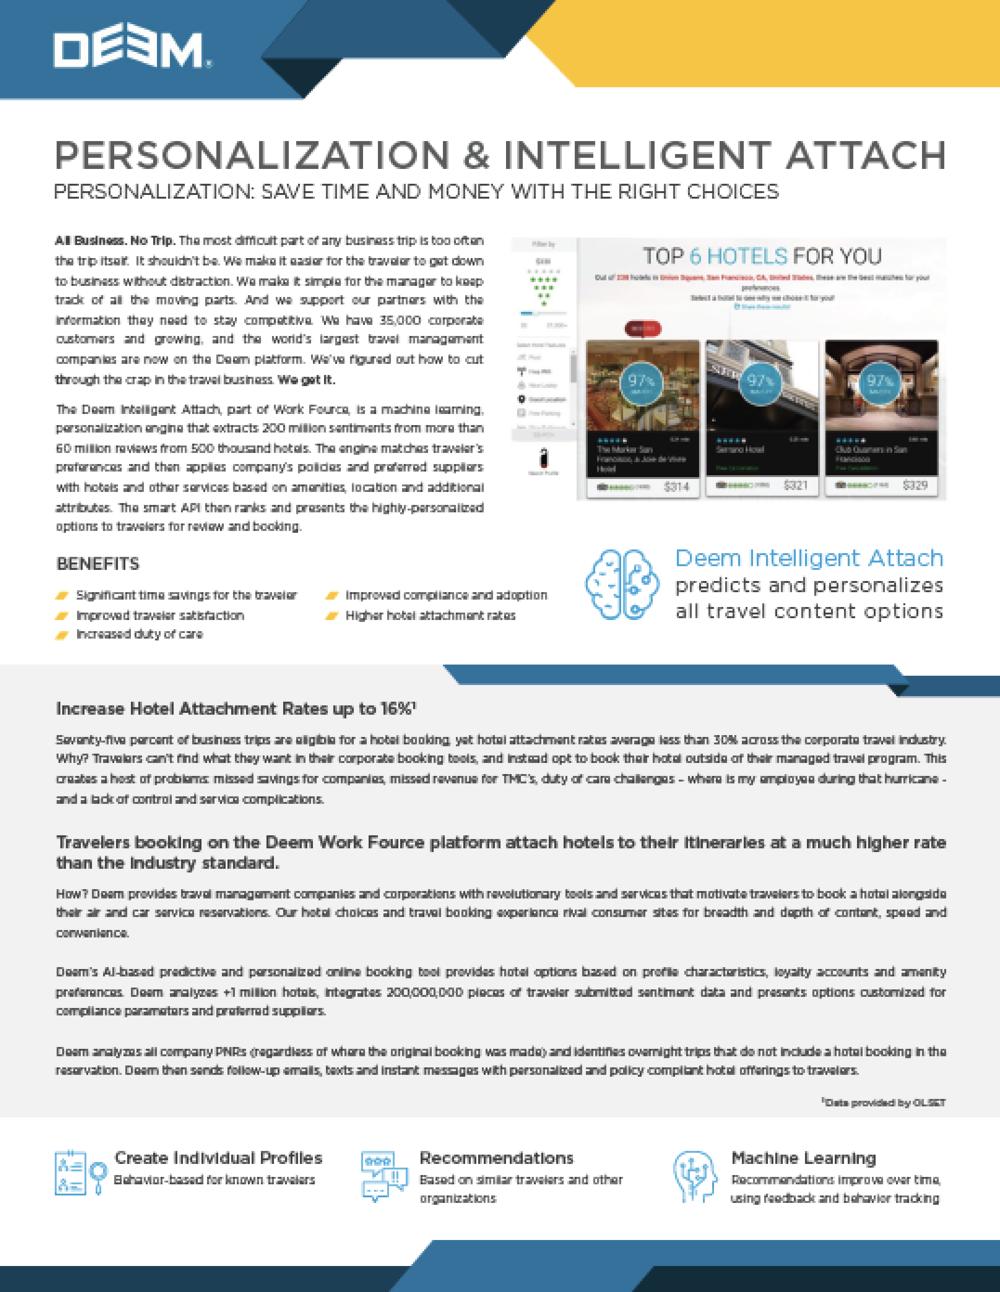 Personalization and Intelligent Attach -